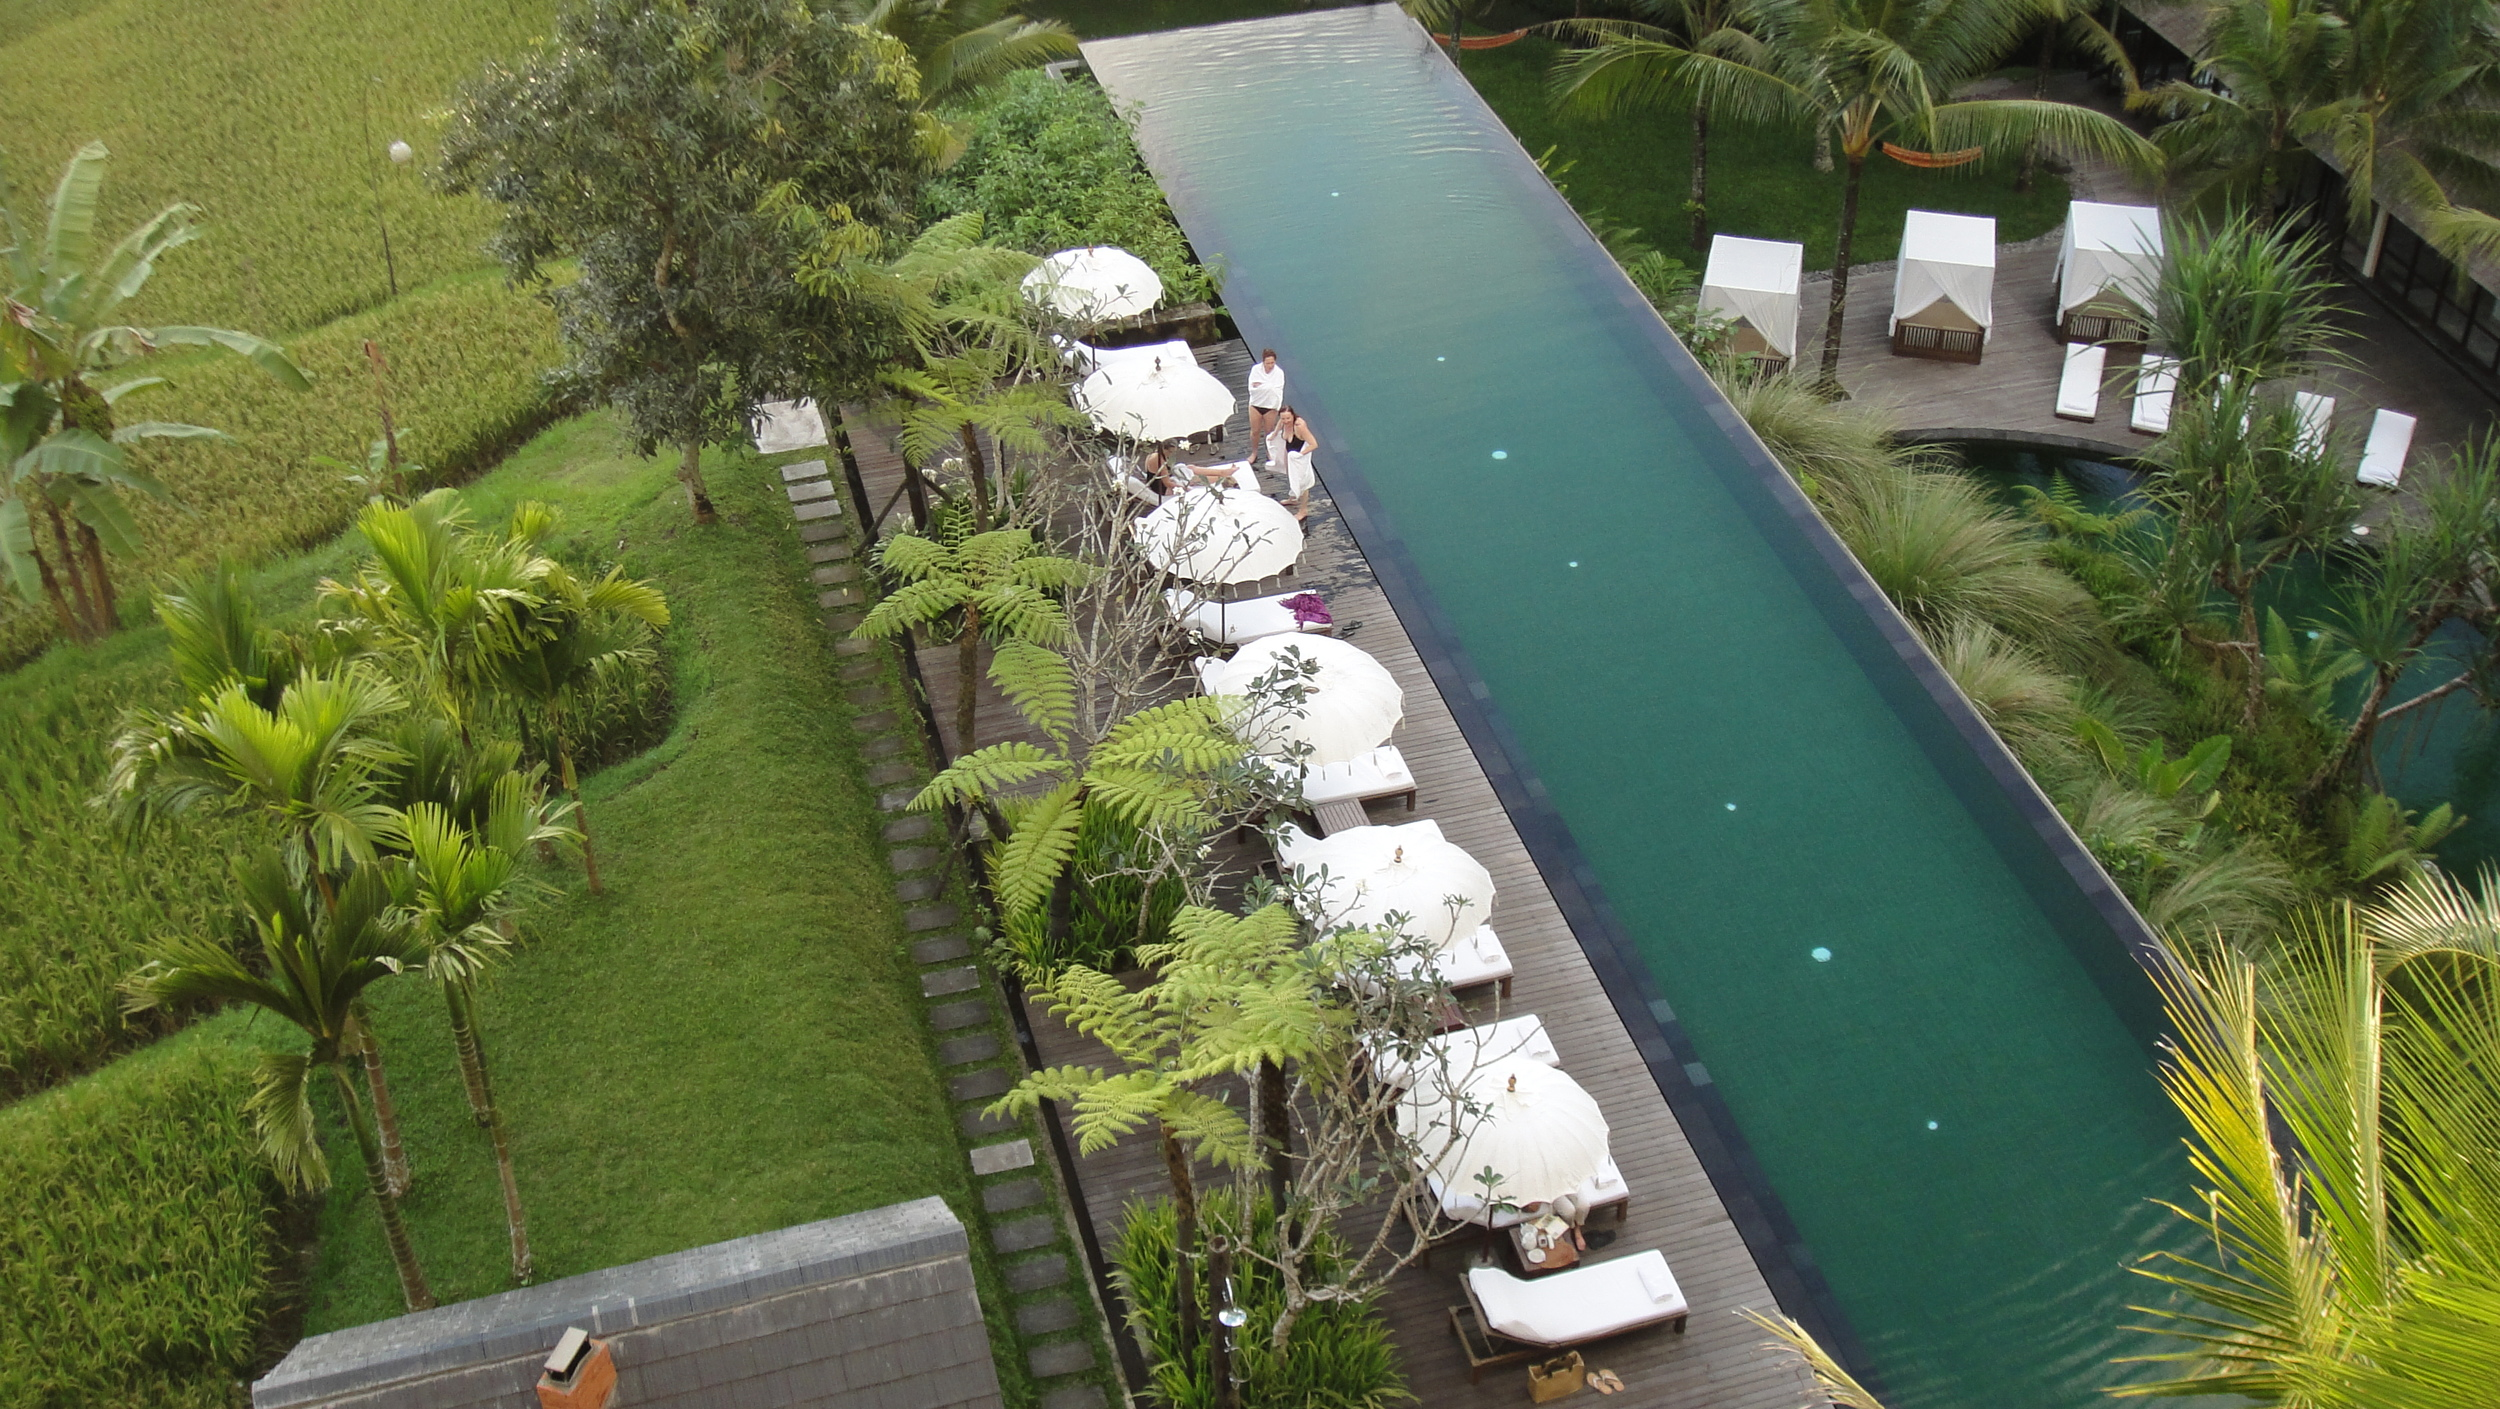 Bali 2009 more 17.JPG